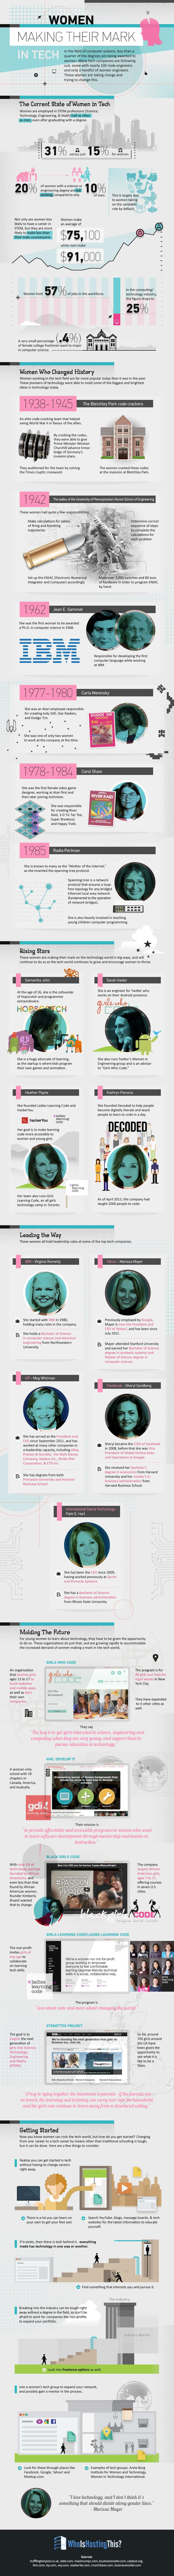 Women Making Their Mark In Tech